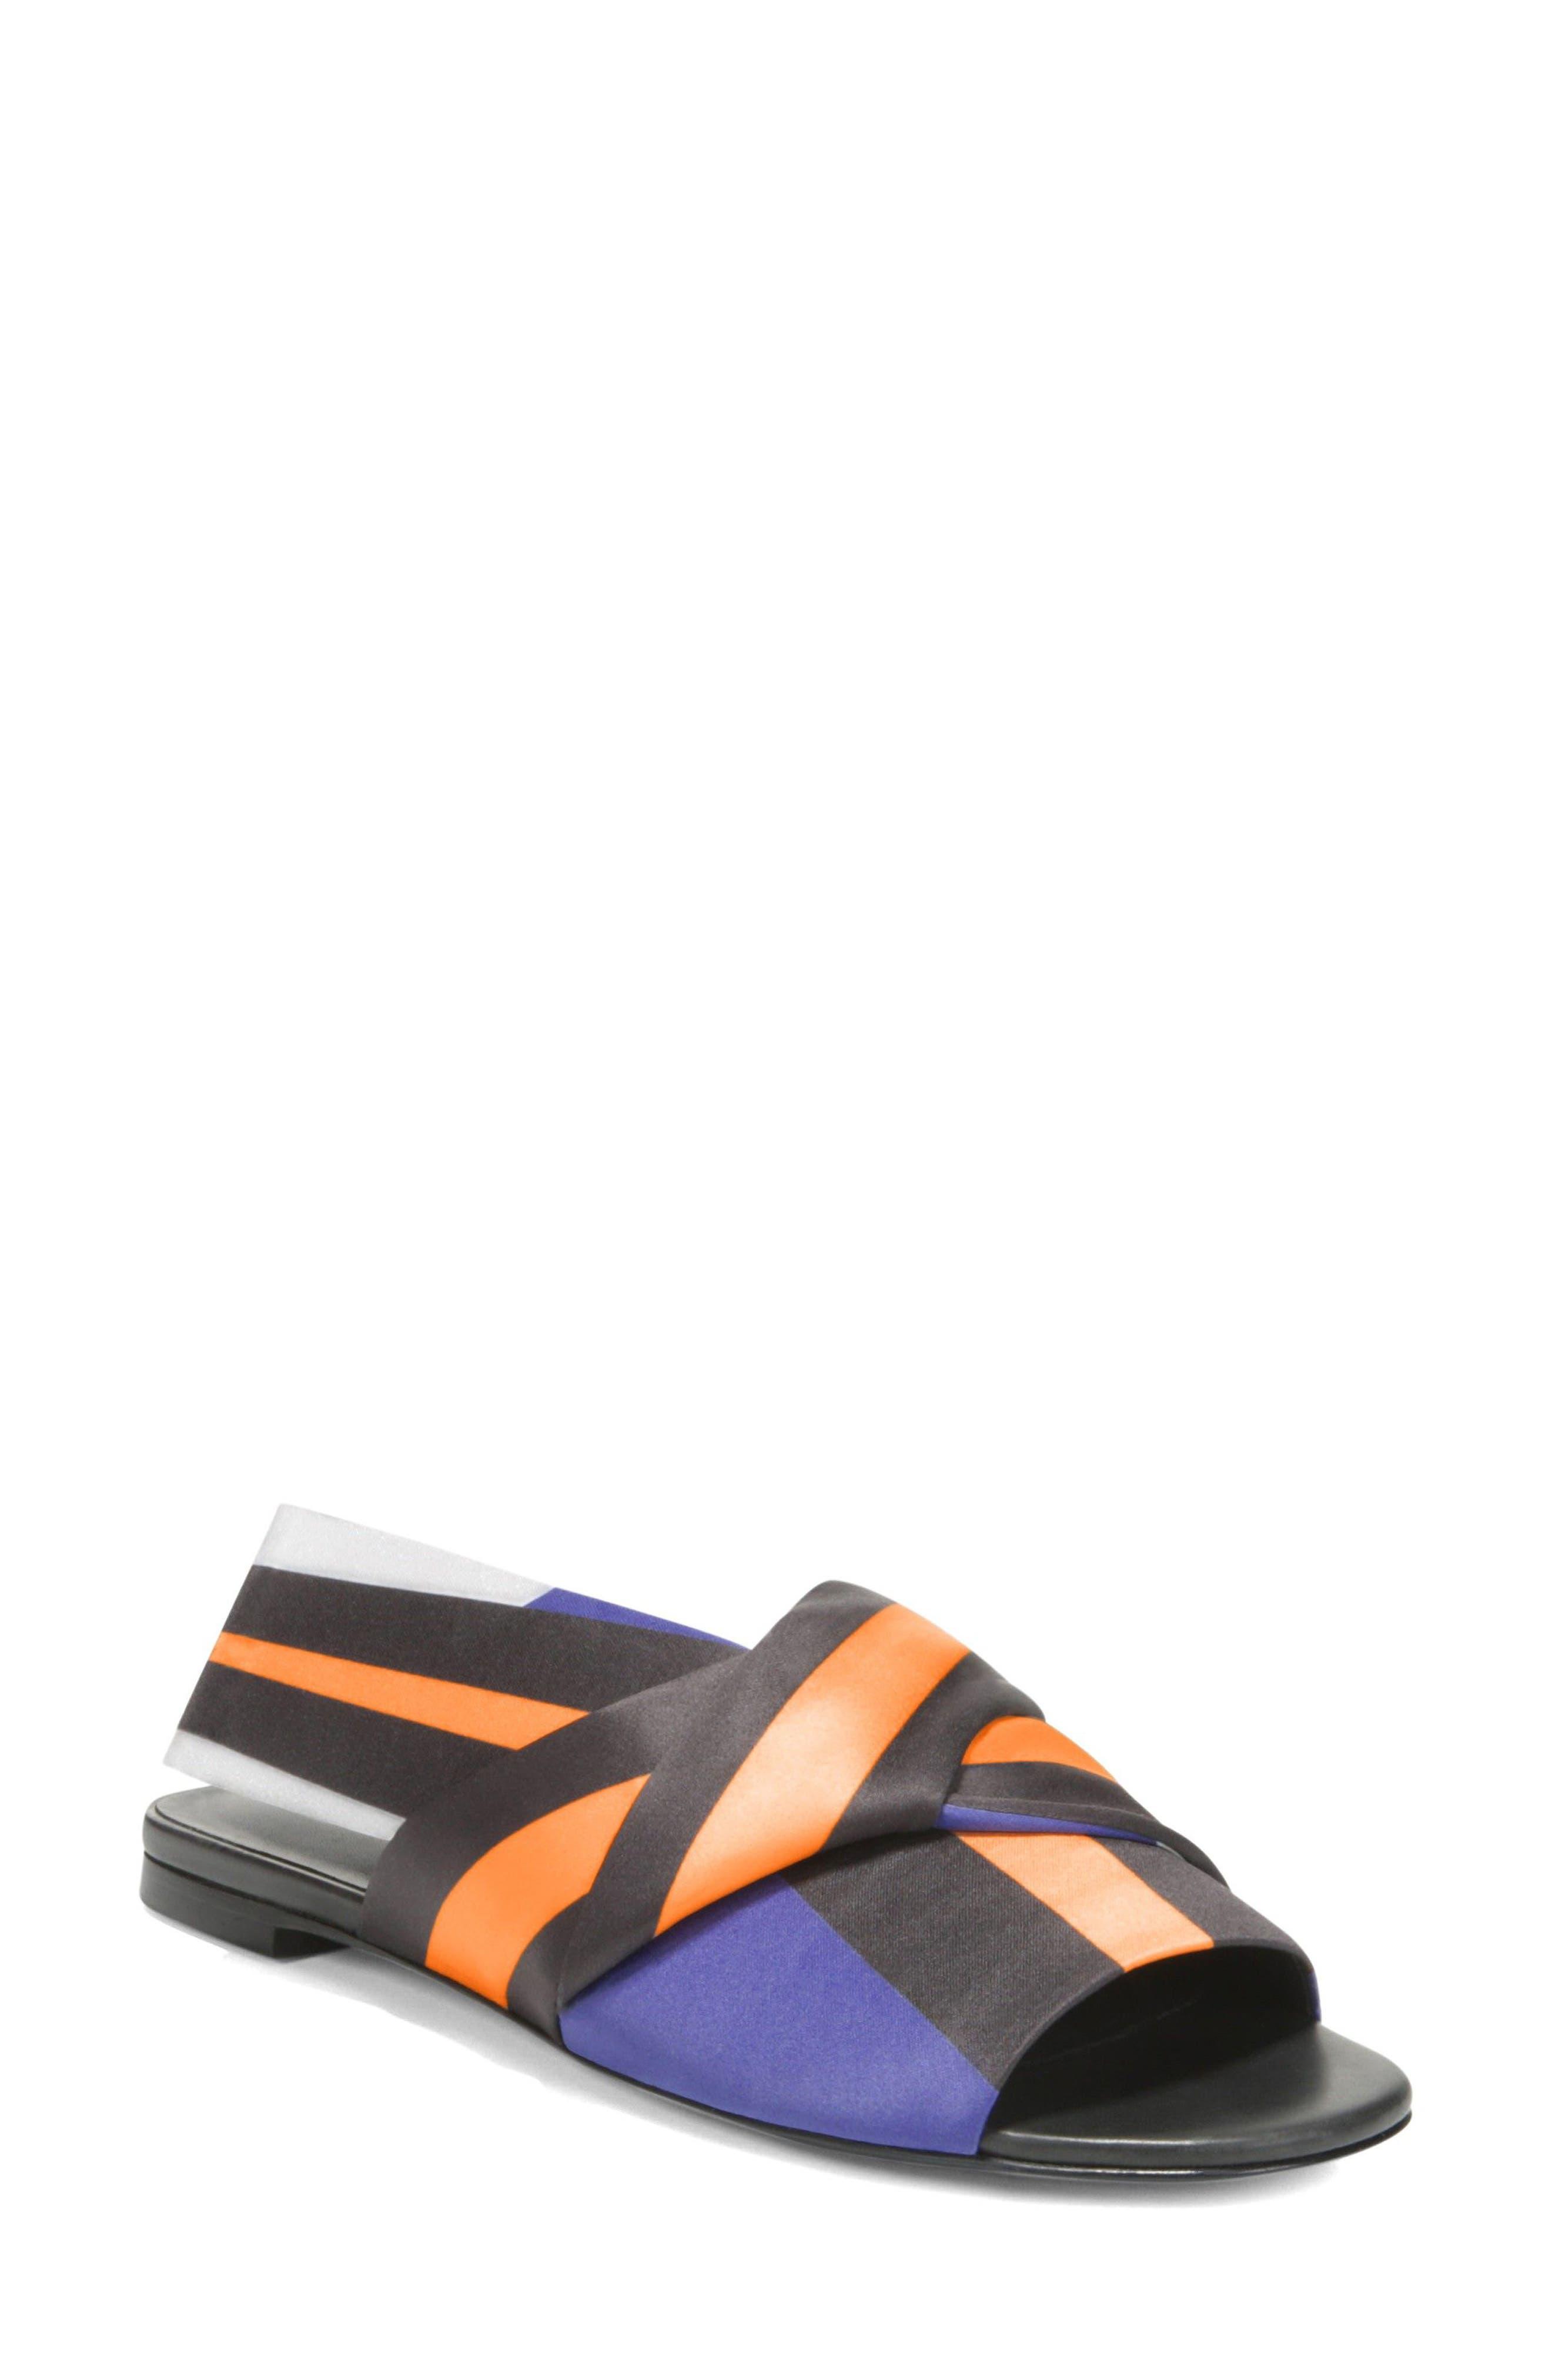 Halina Slide Sandal,                             Main thumbnail 1, color,                             Sapphire/ Wine Fabric